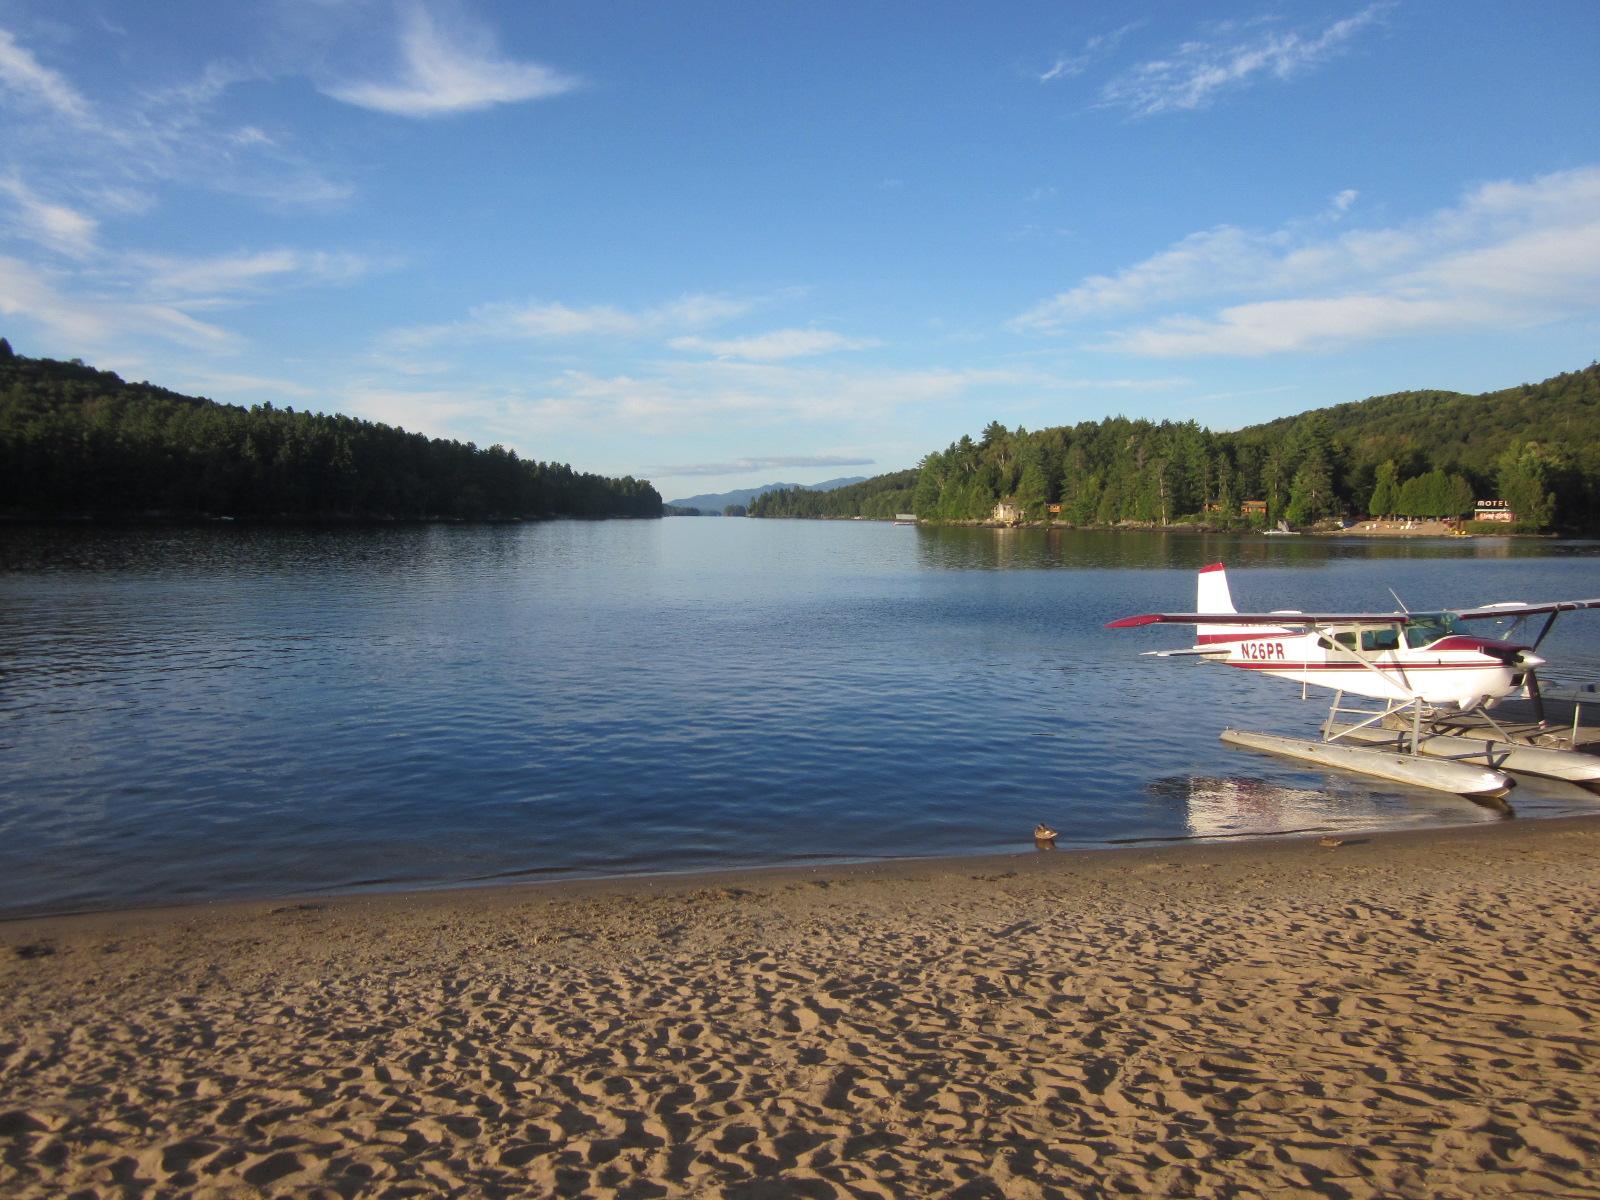 Long Lake, in the Adirondacks